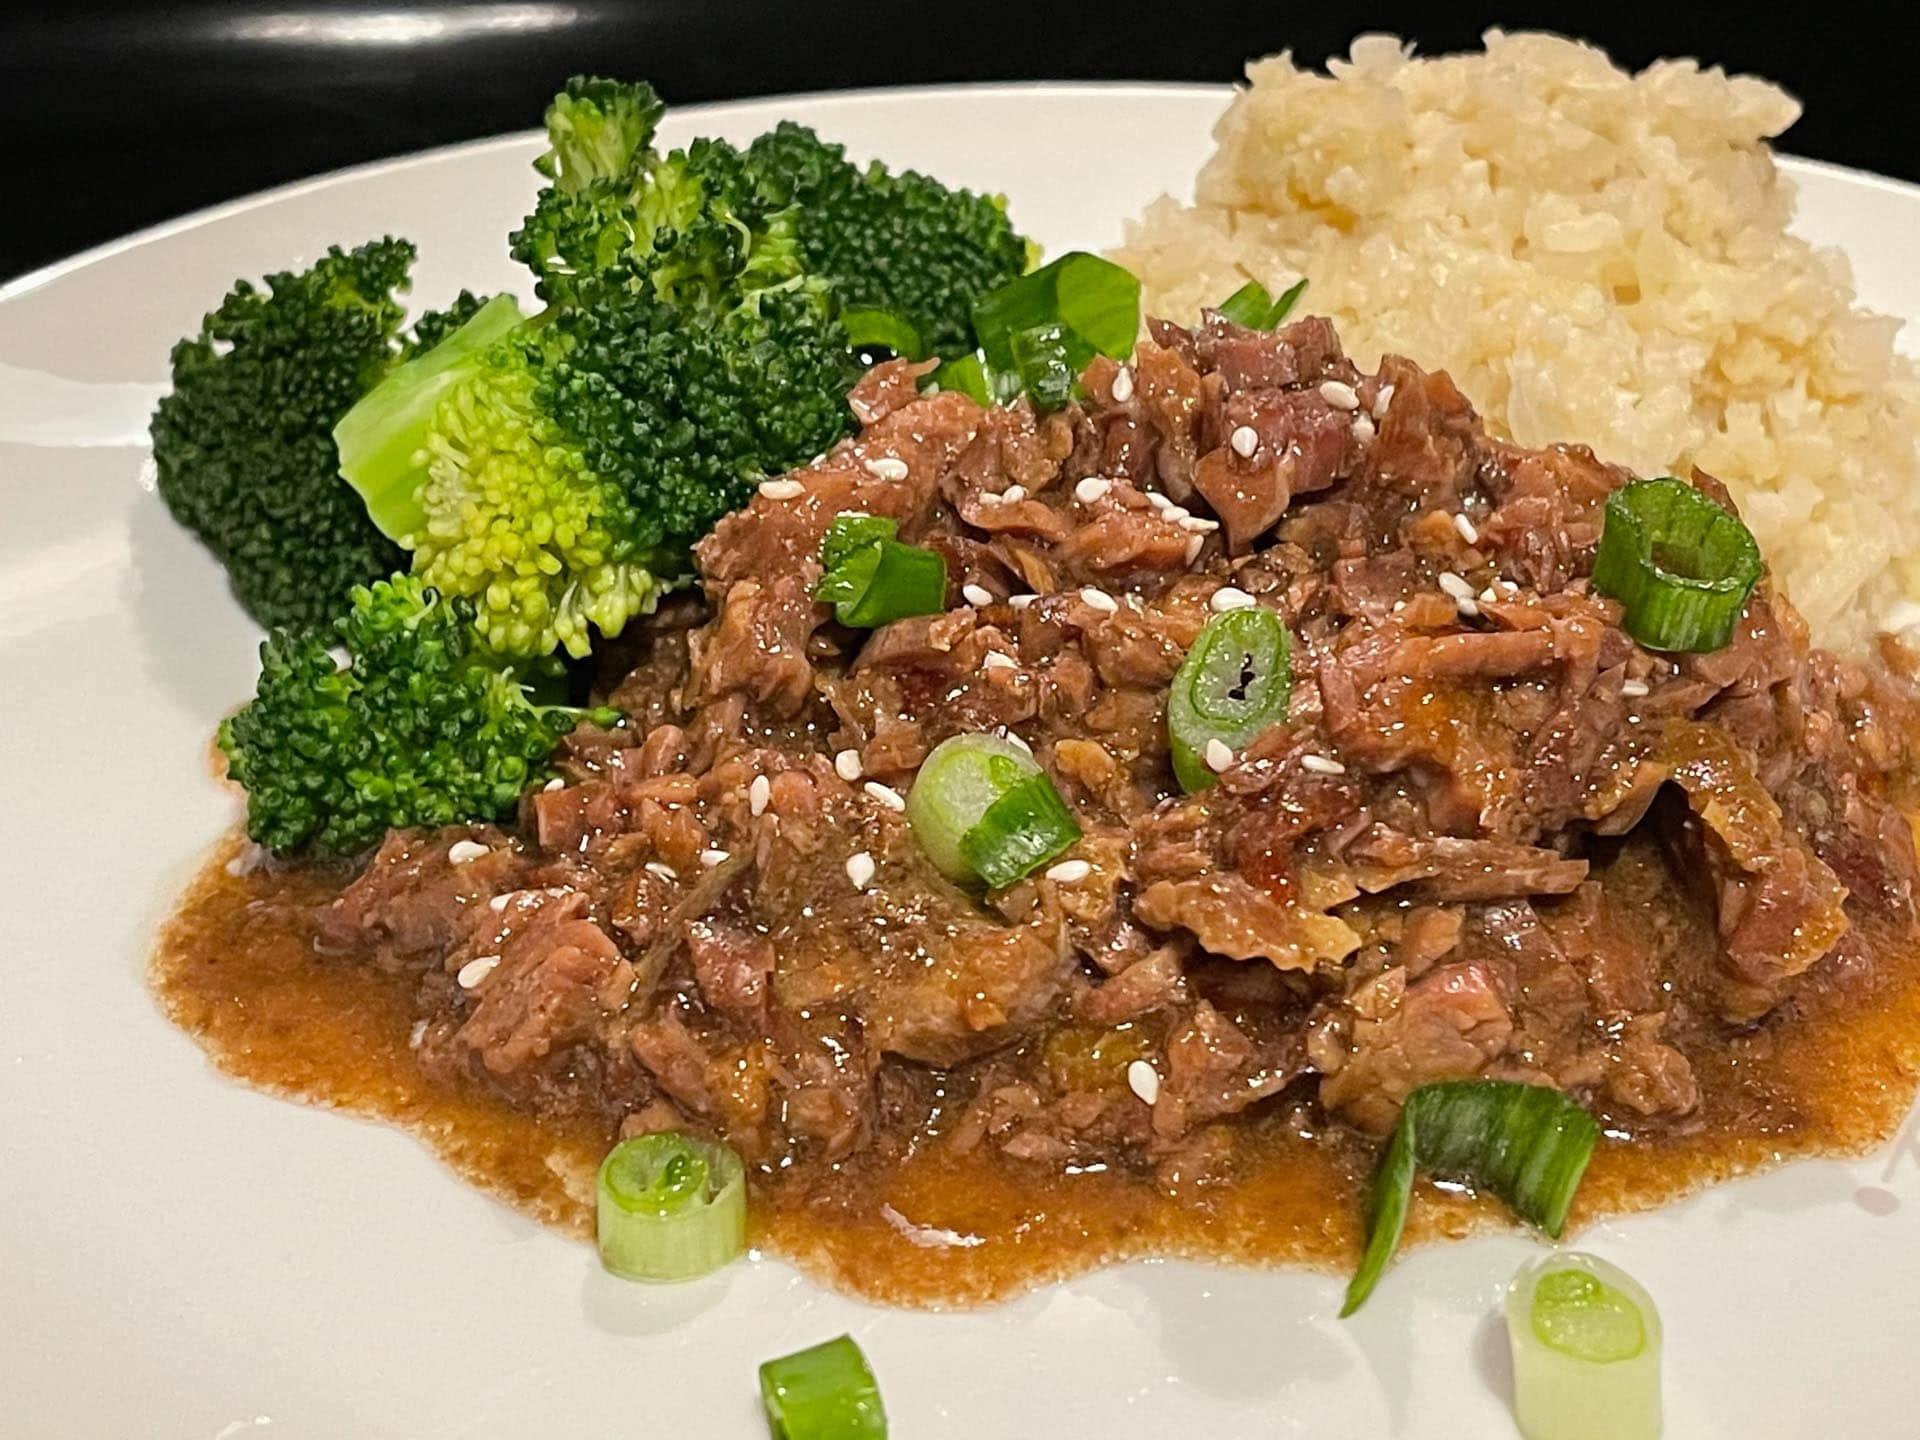 Beef Mongolian Keto Style with broccoli and cauliflower rice